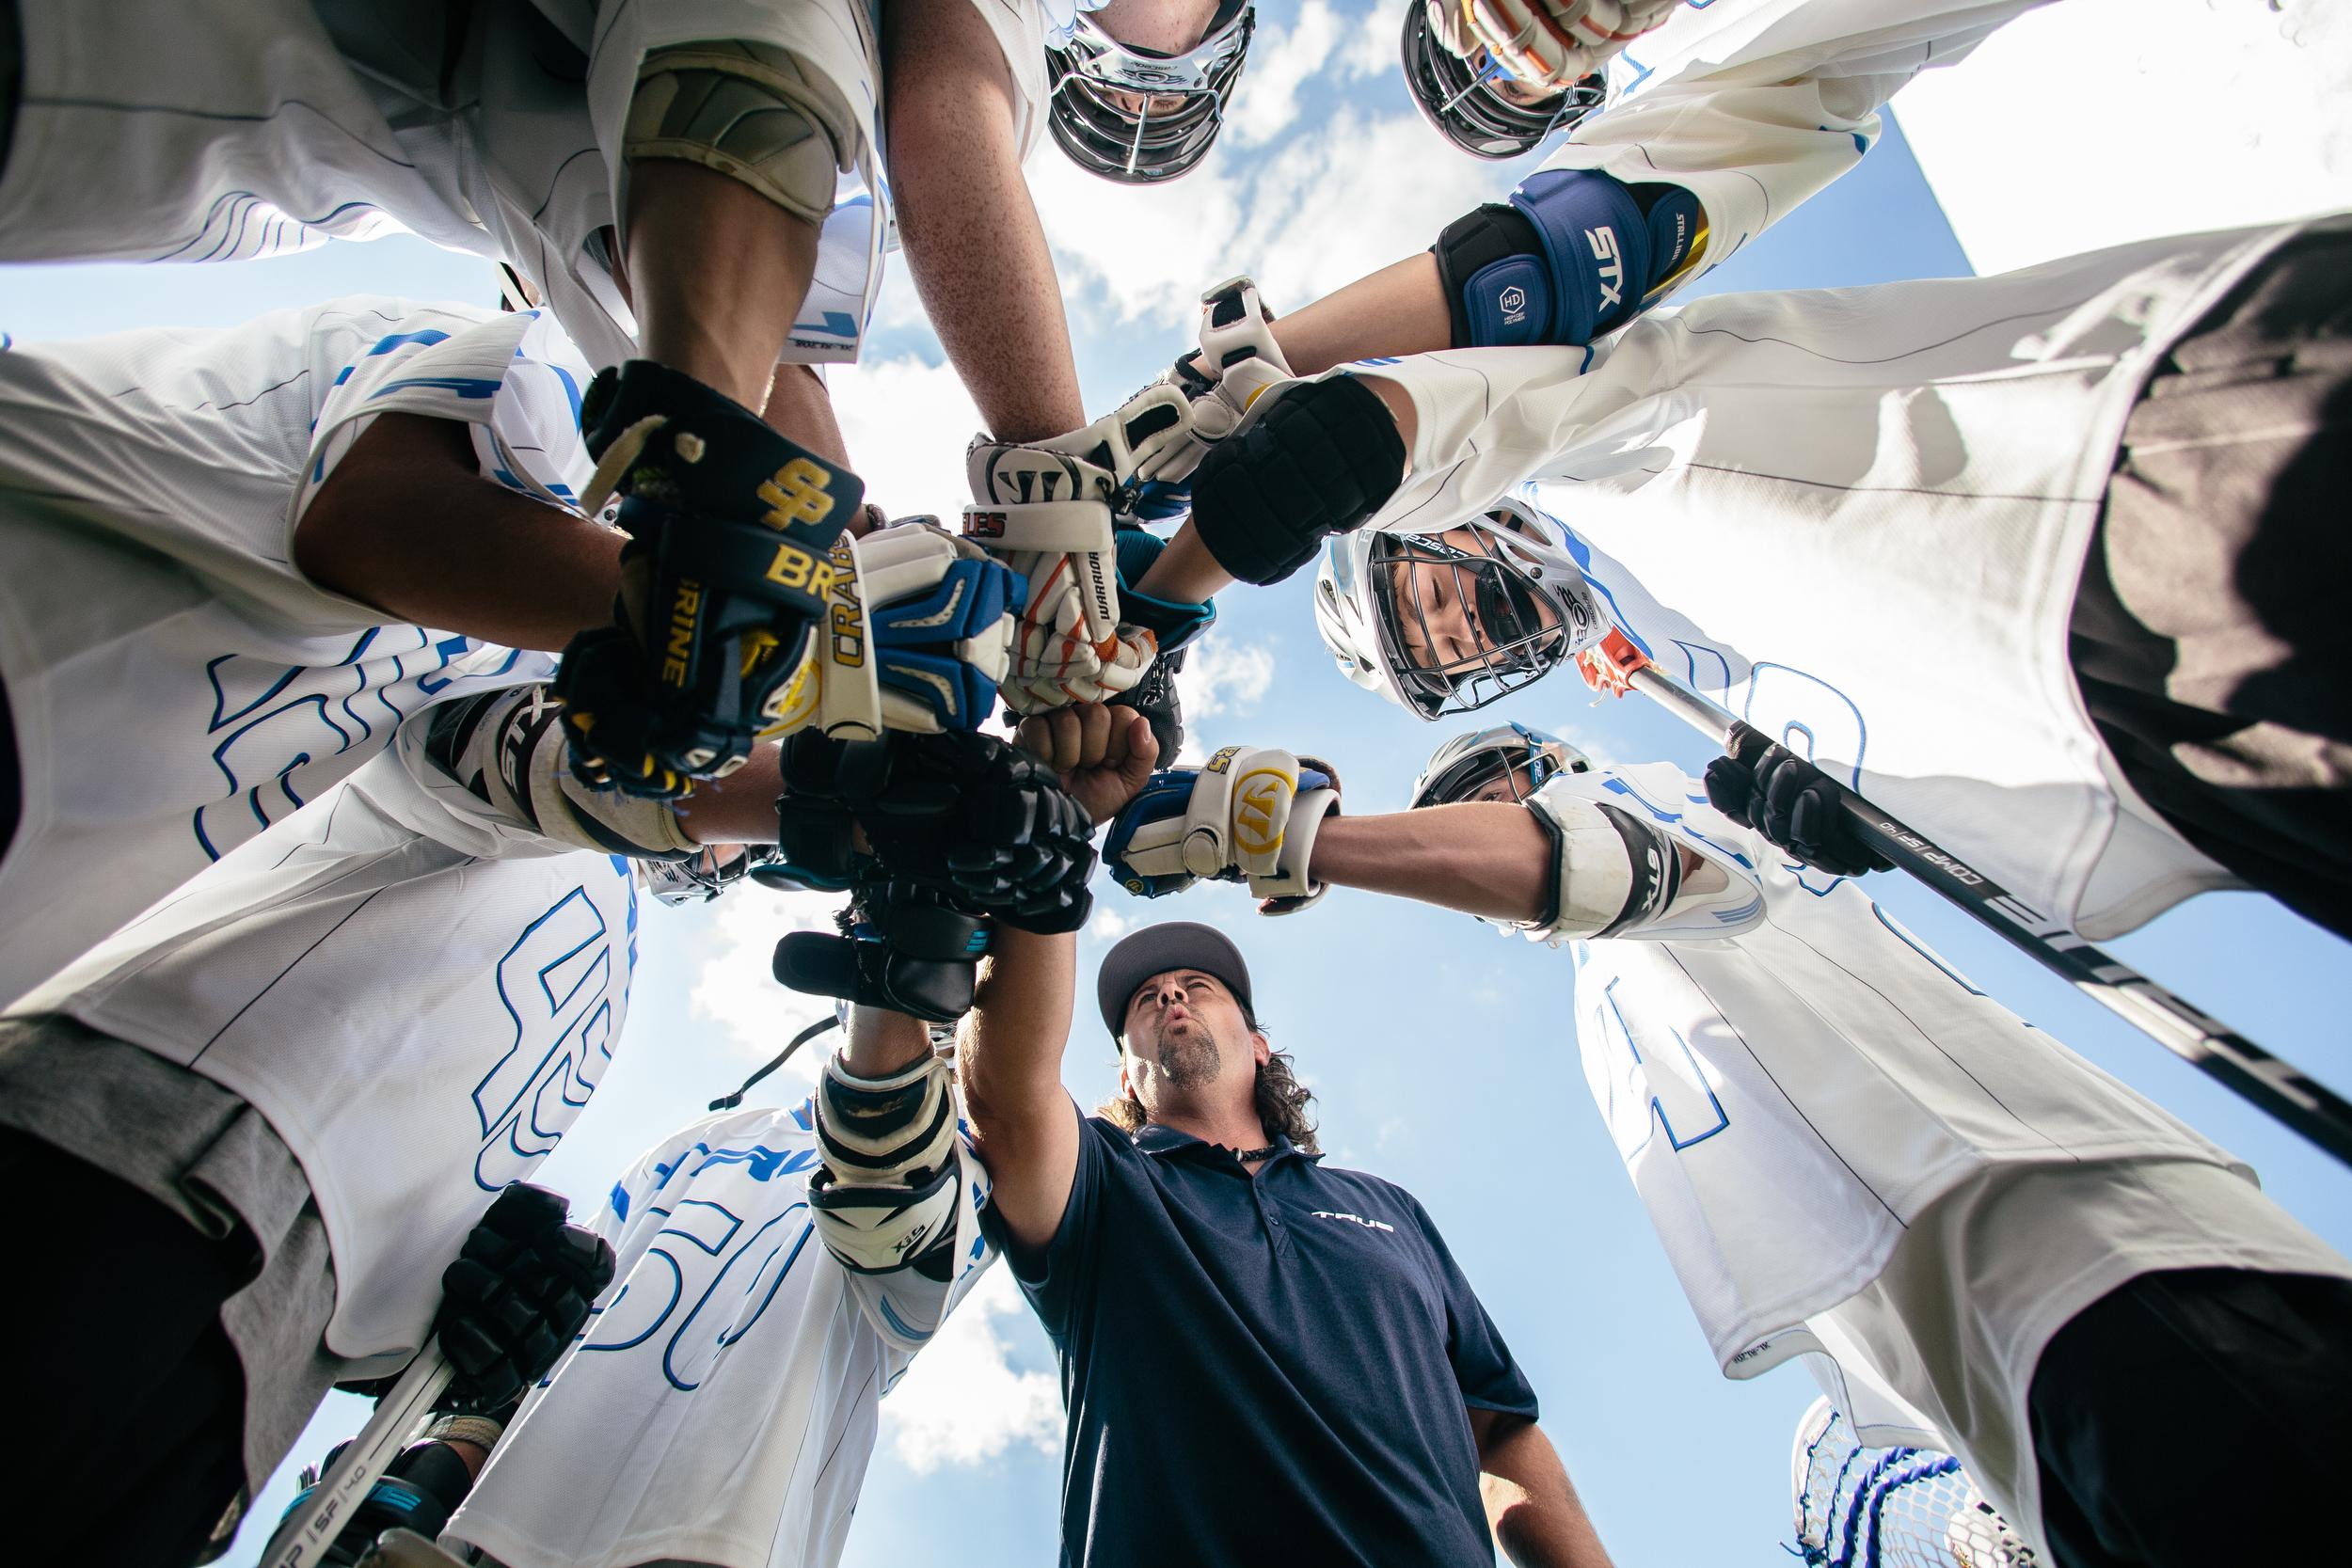 Jul 22, 2015; Baltimore, MD, USA; TRUE Lacrosse brand shoot at Boy's Latin School of Maryland in Baltimore, MD. Boys. Mandatory Credit: Brian Schneider-www.ebrianschneider.com